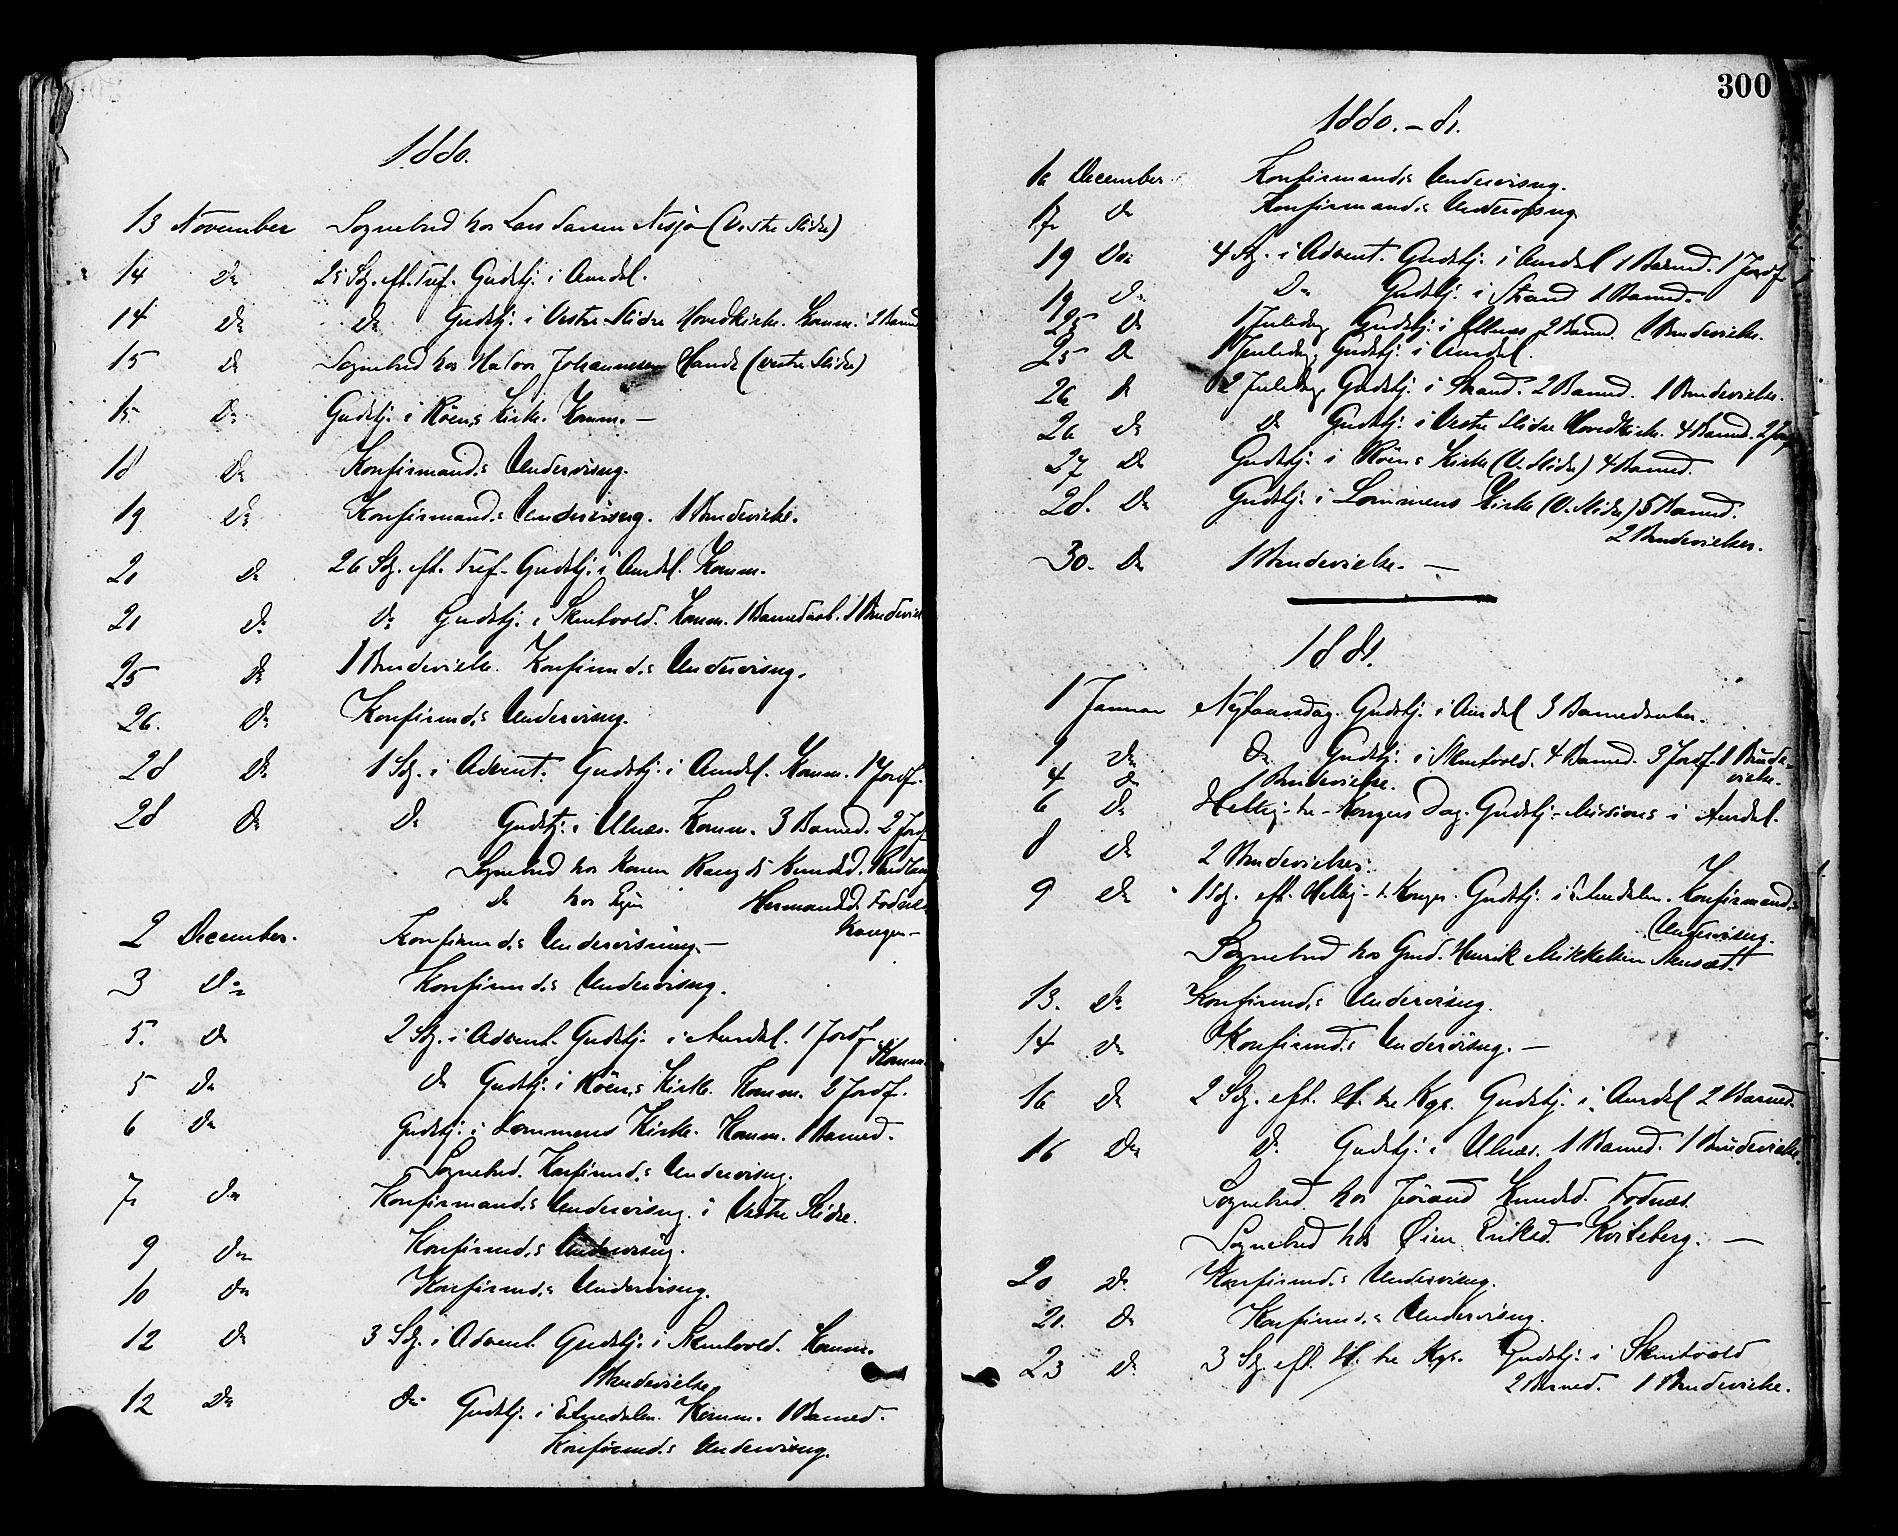 SAH, Nord-Aurdal prestekontor, Ministerialbok nr. 9, 1876-1882, s. 300